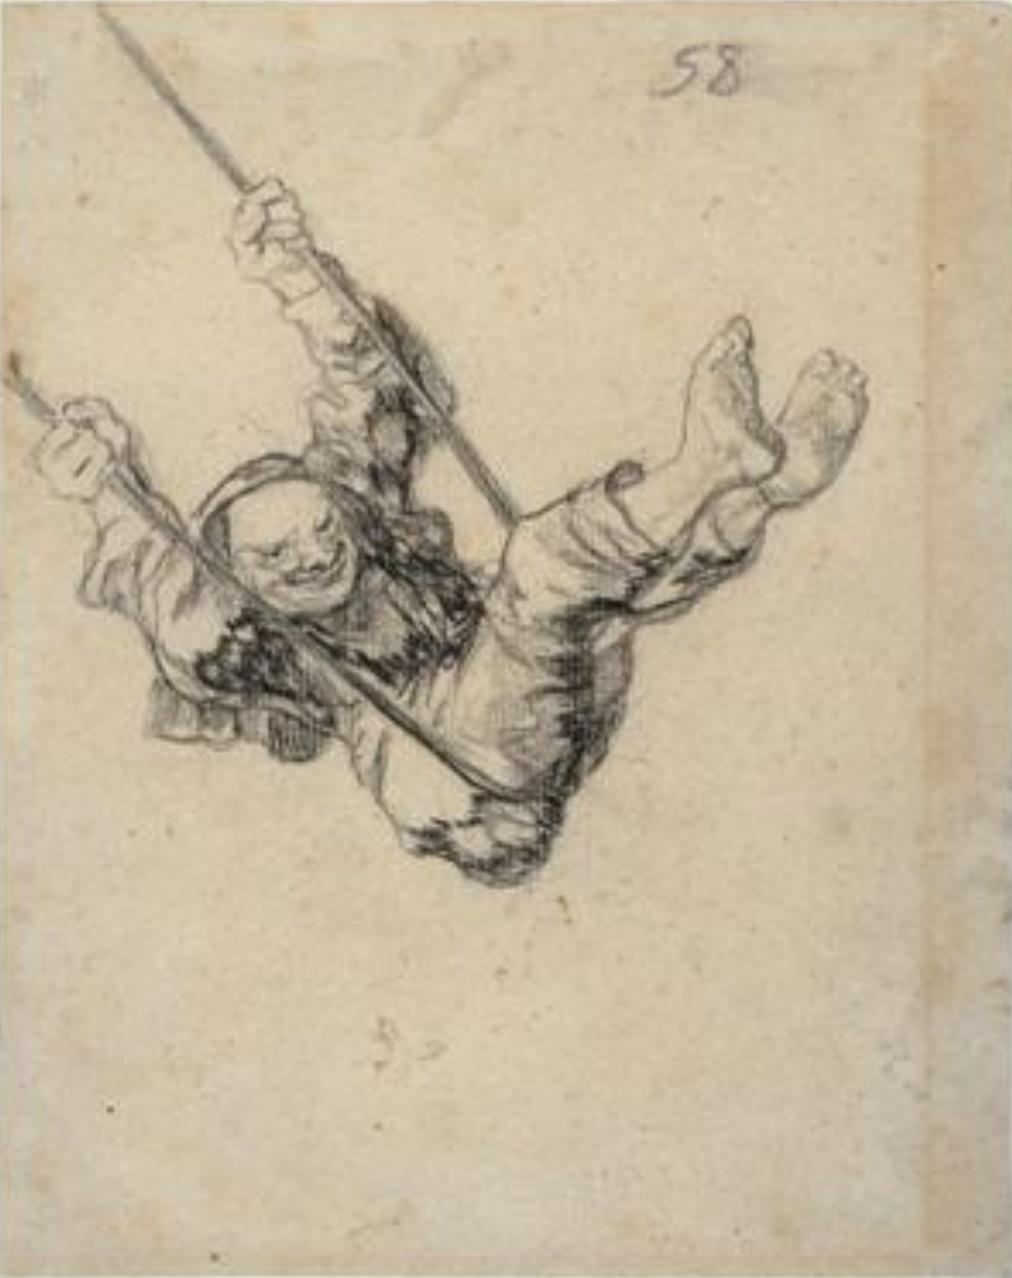 Dibuixos espanyols a la Hispanic Society of America. Del Segle d'Or a Goya